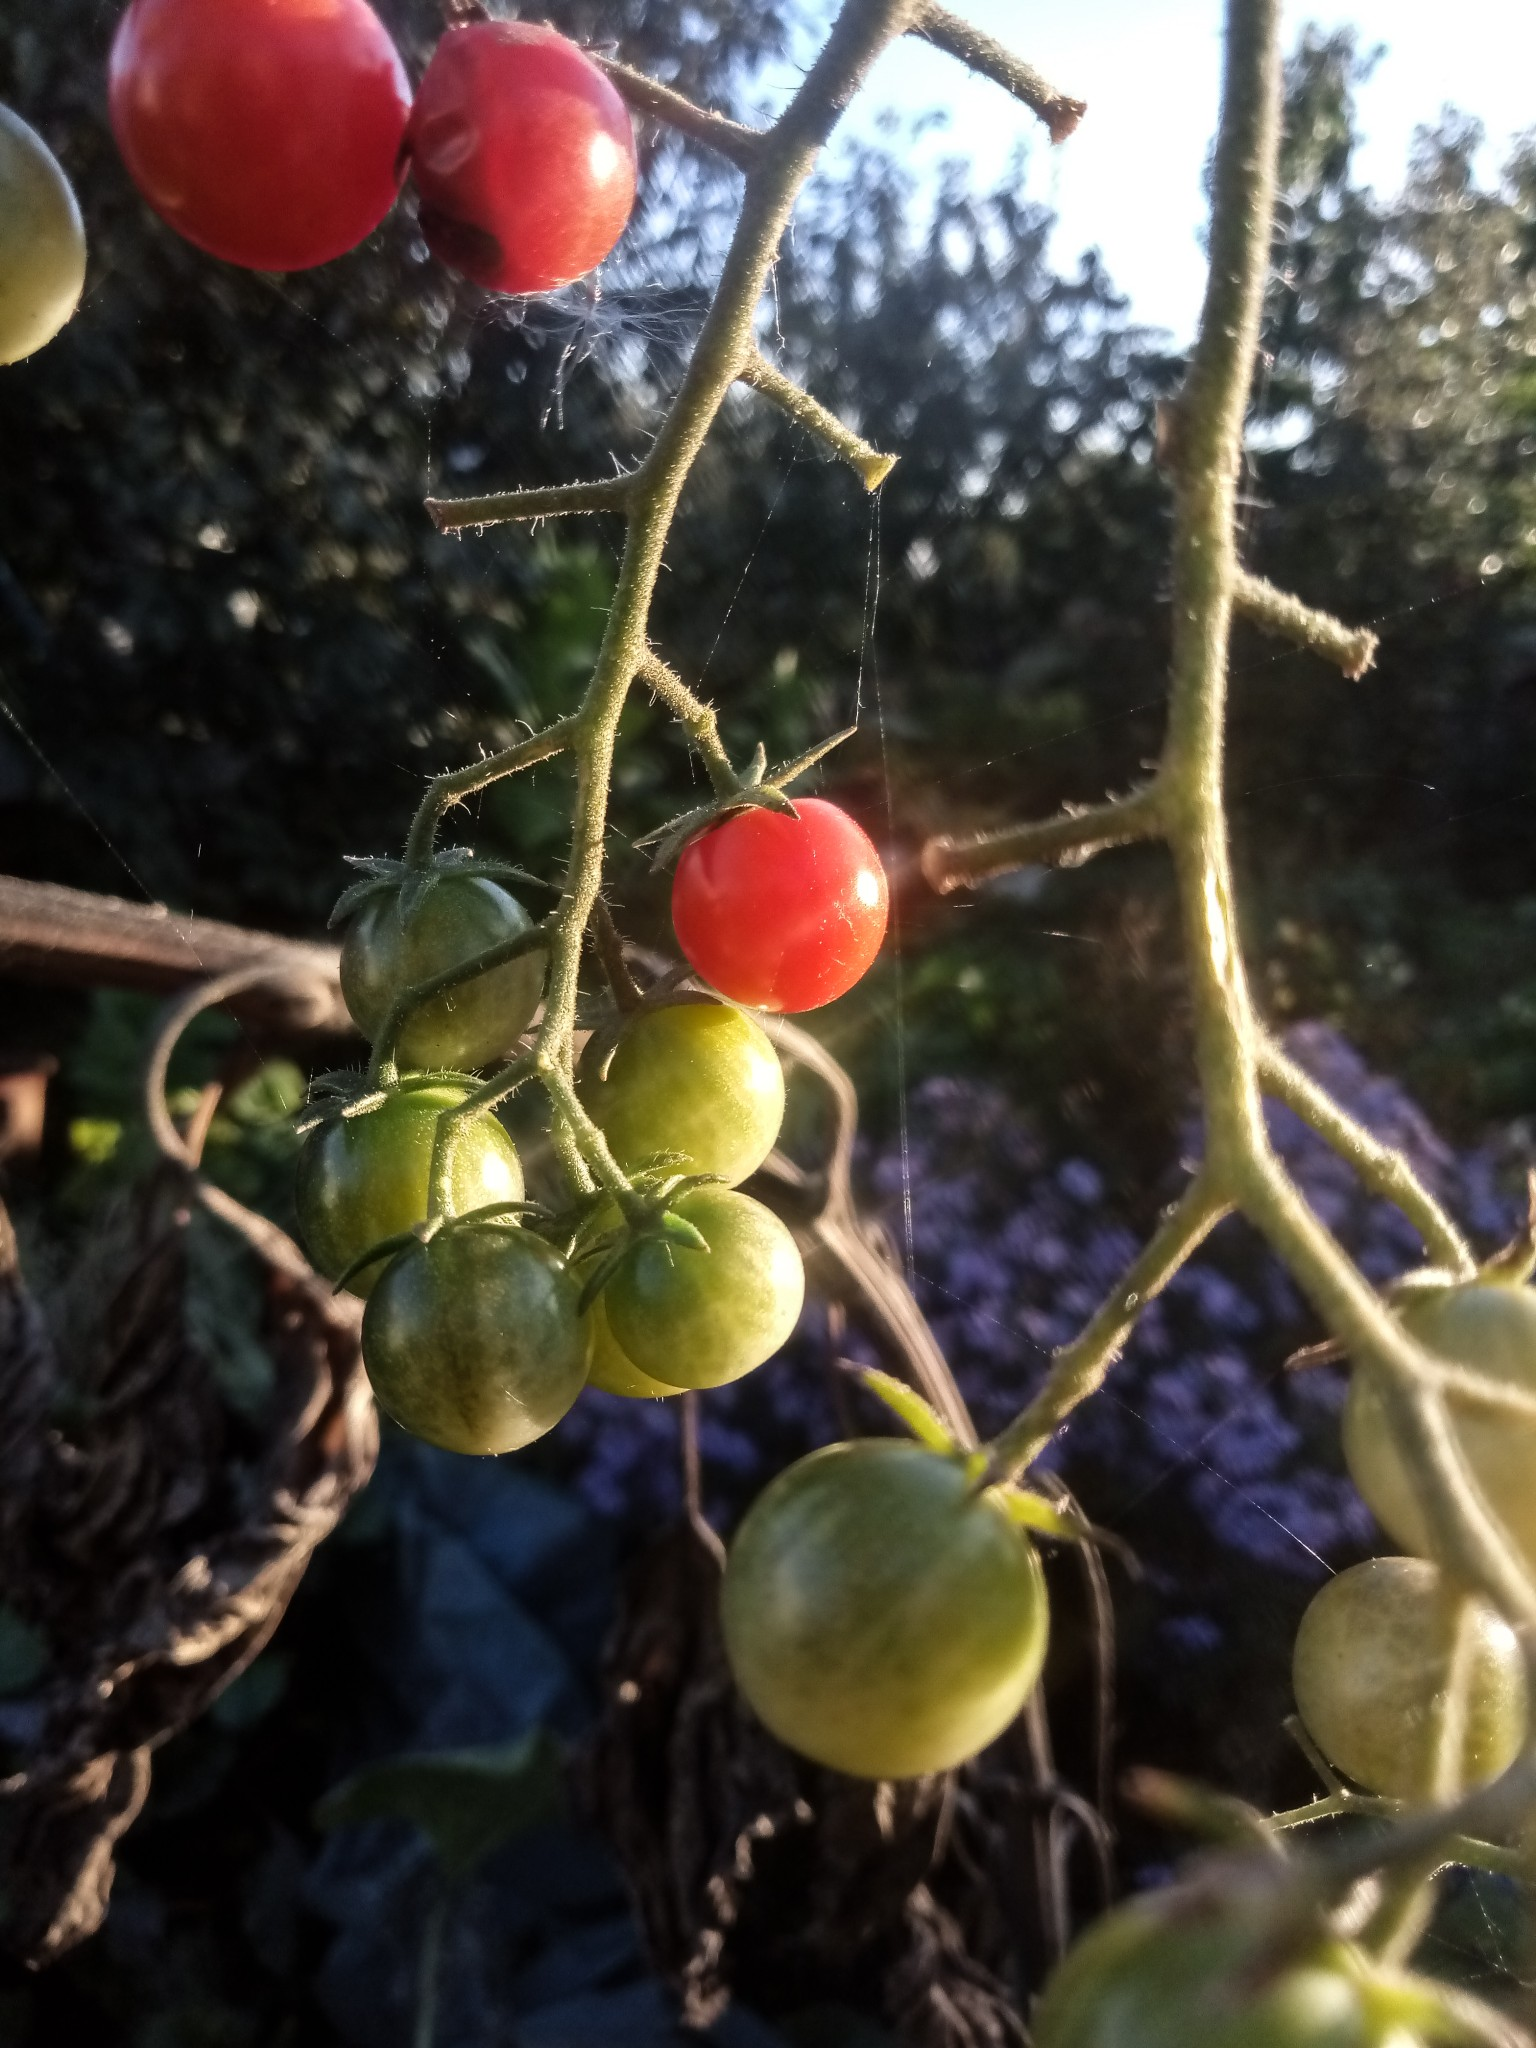 Cherry tomatoes photo 6